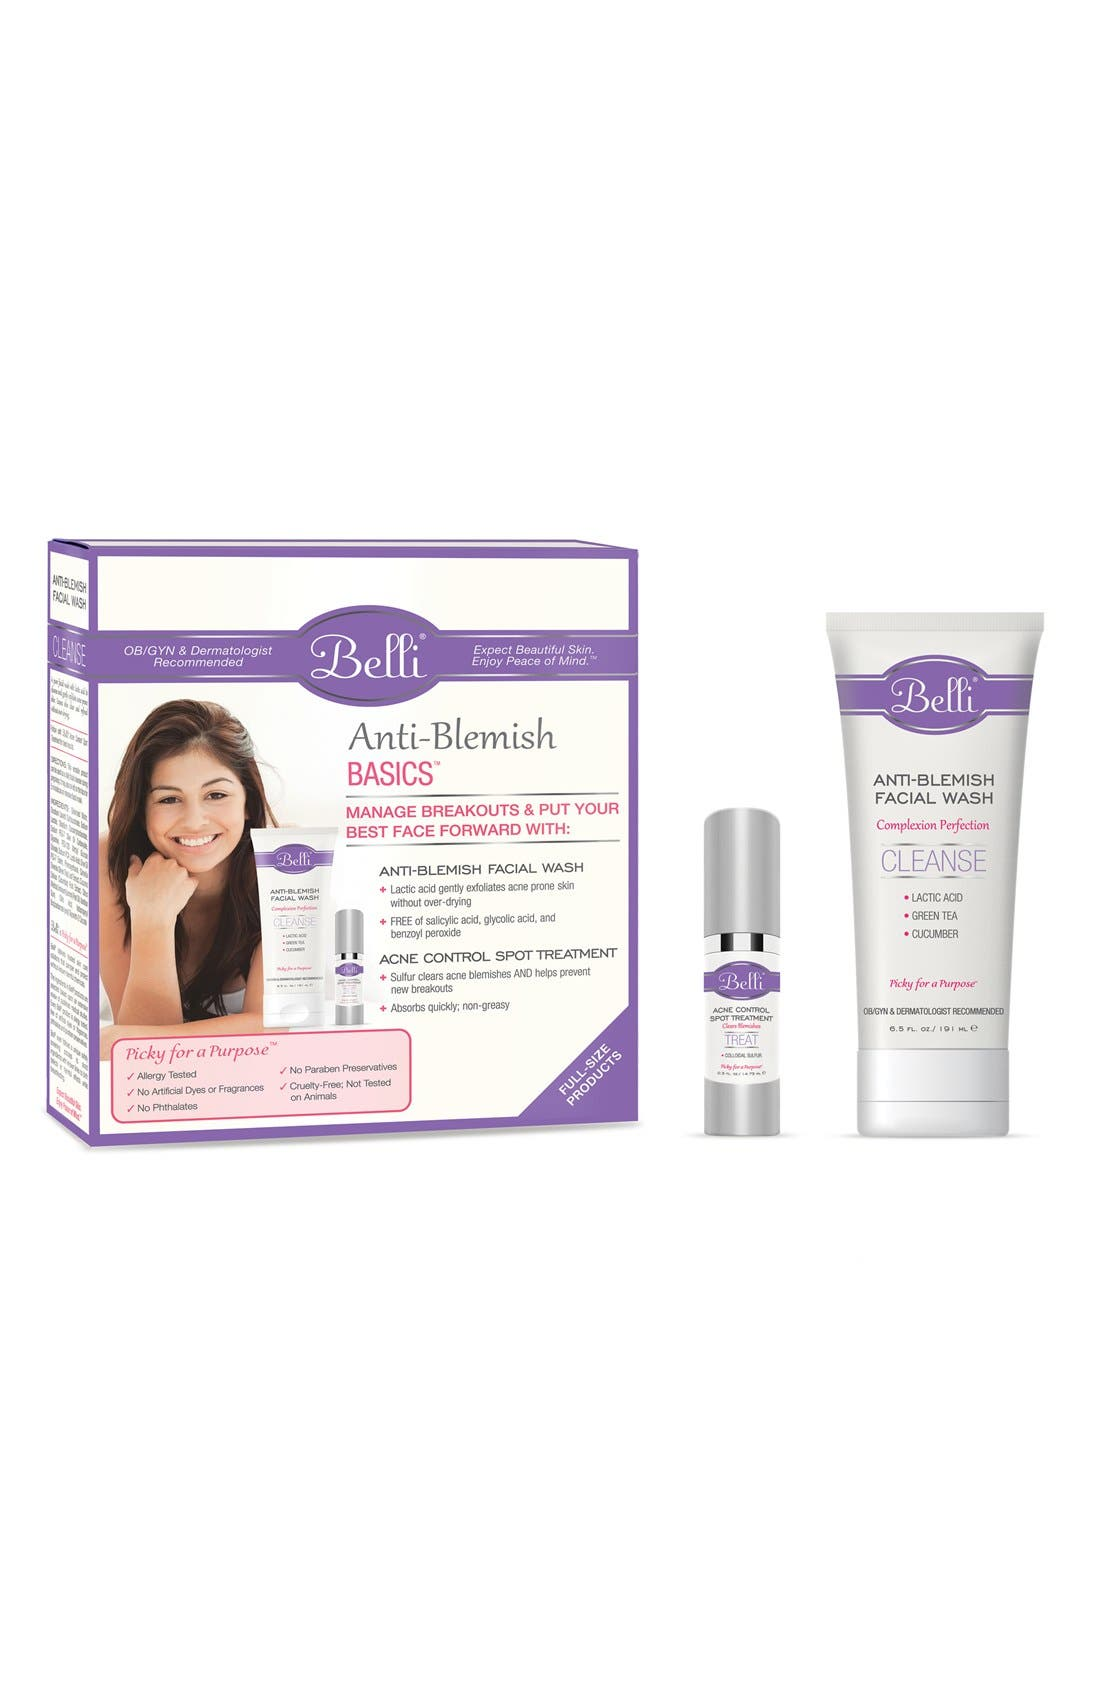 Anti-Blemish Basics with Anti-Blemish Facial Wash (6.5 oz.) & Acne Control Spot Treatment,                             Main thumbnail 1, color,                             WHITE